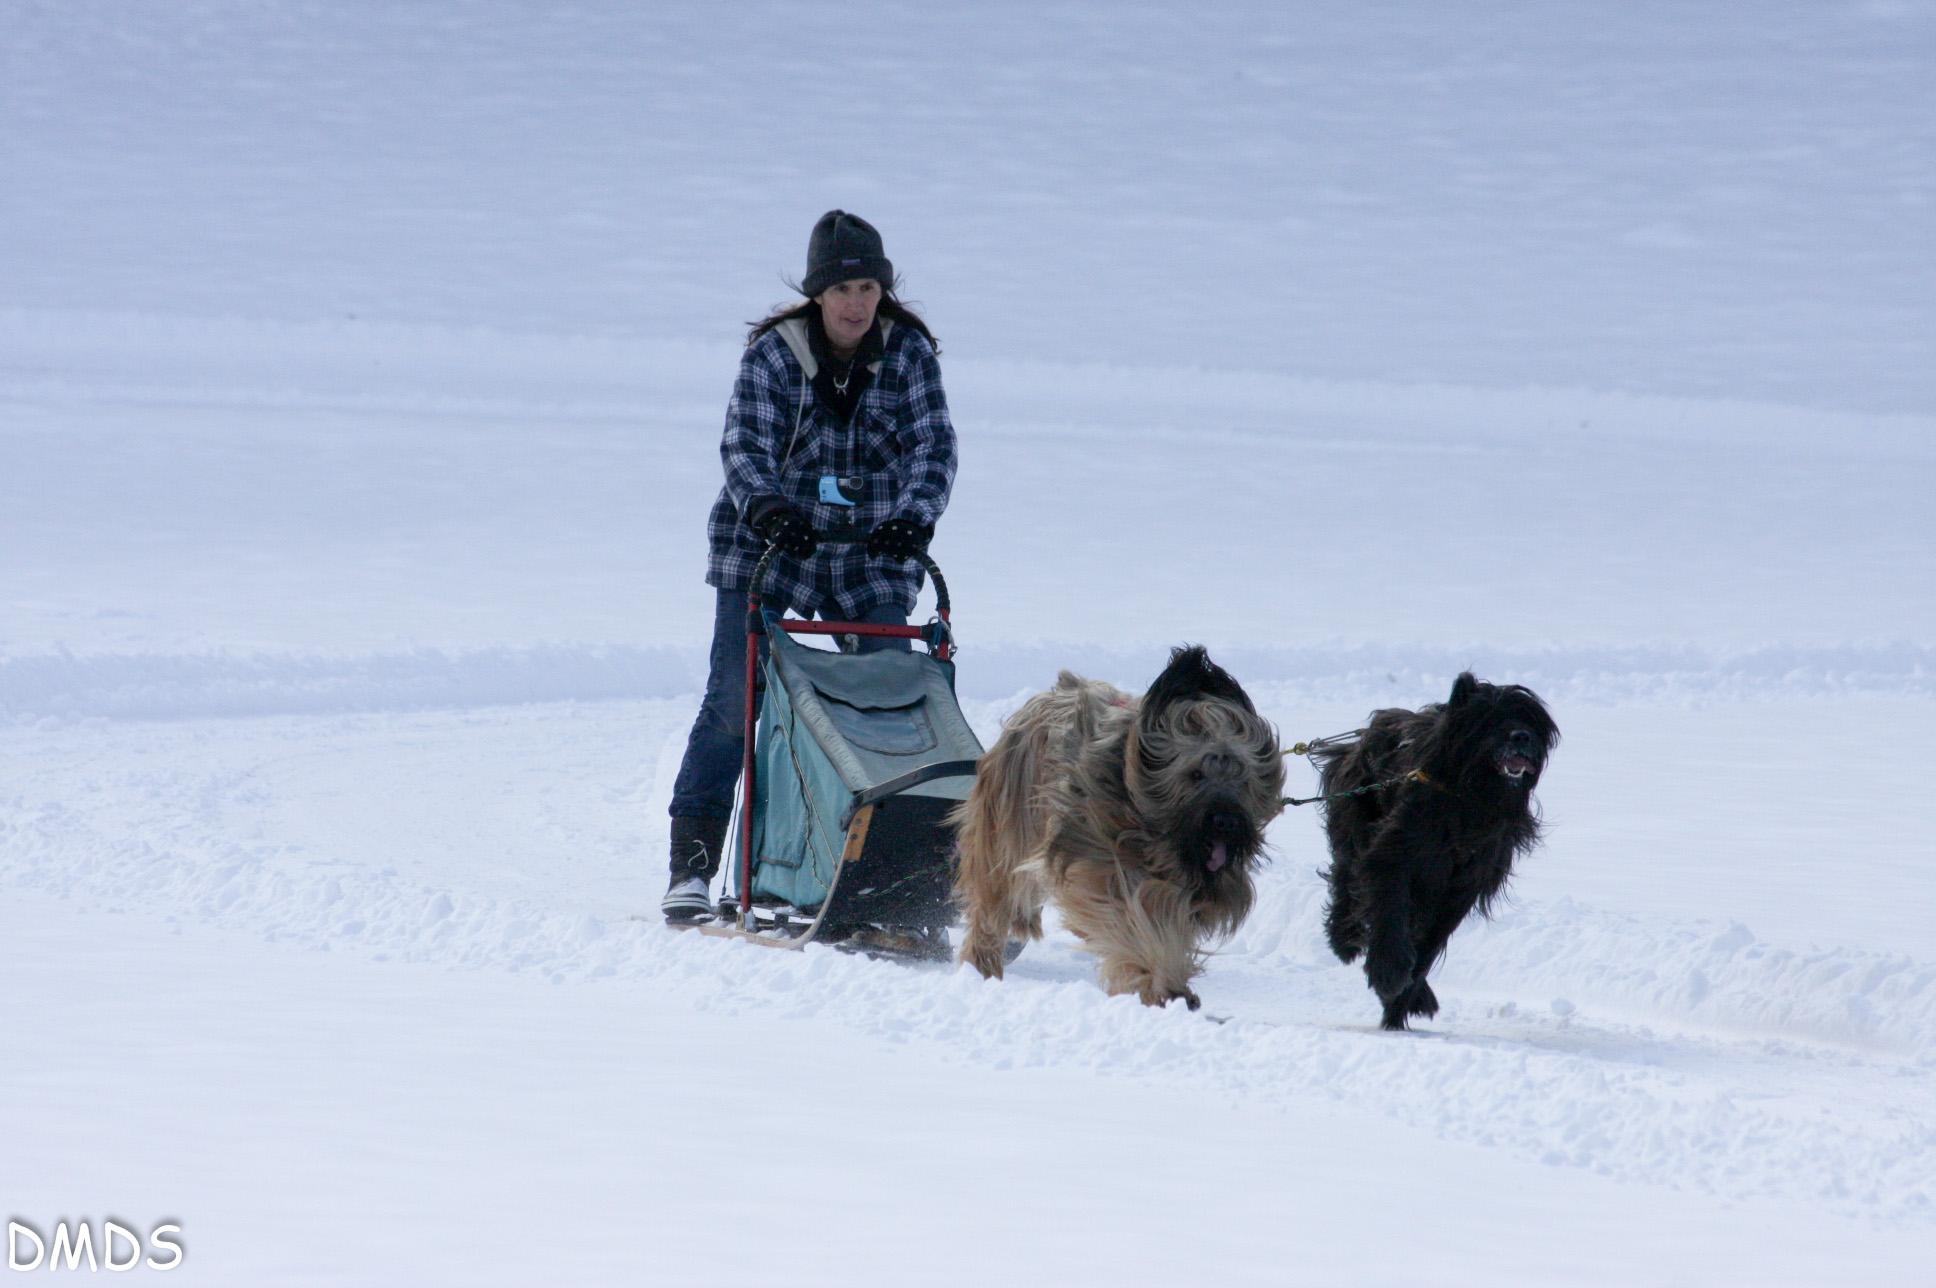 DMDS Wheel dogs und Lead dogs